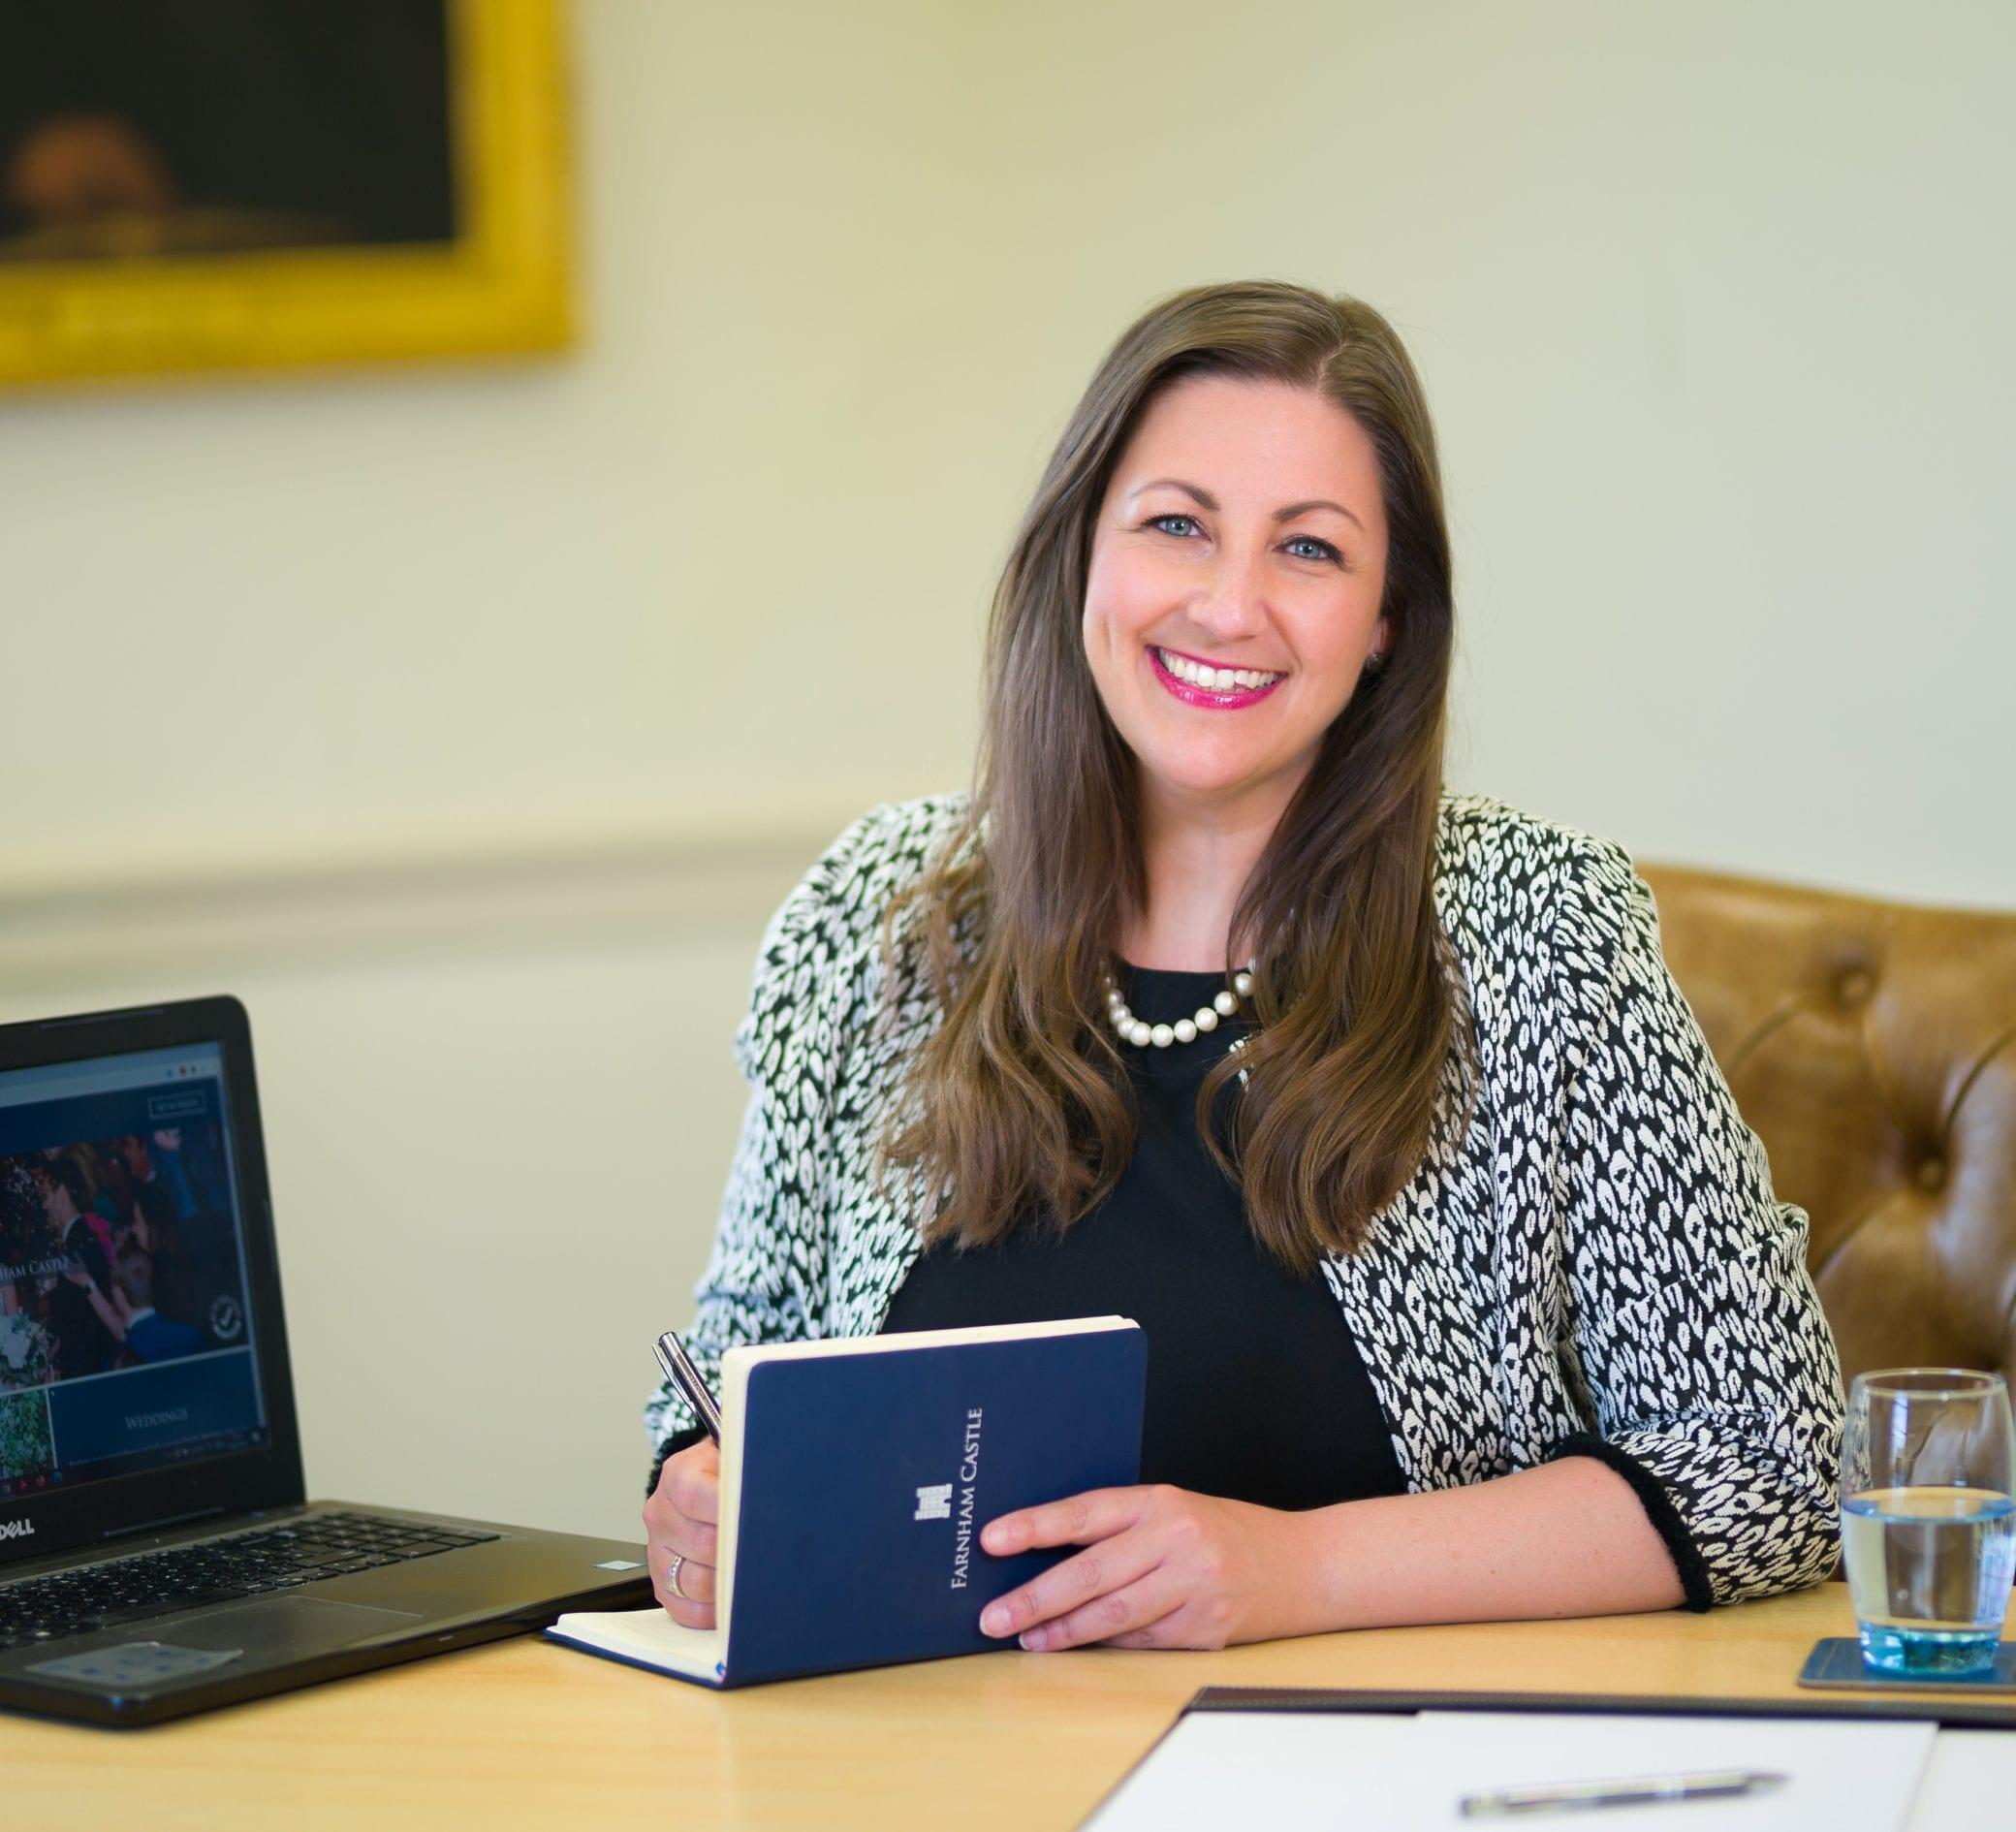 Head of Marketing at Farnham Castle in Surrey